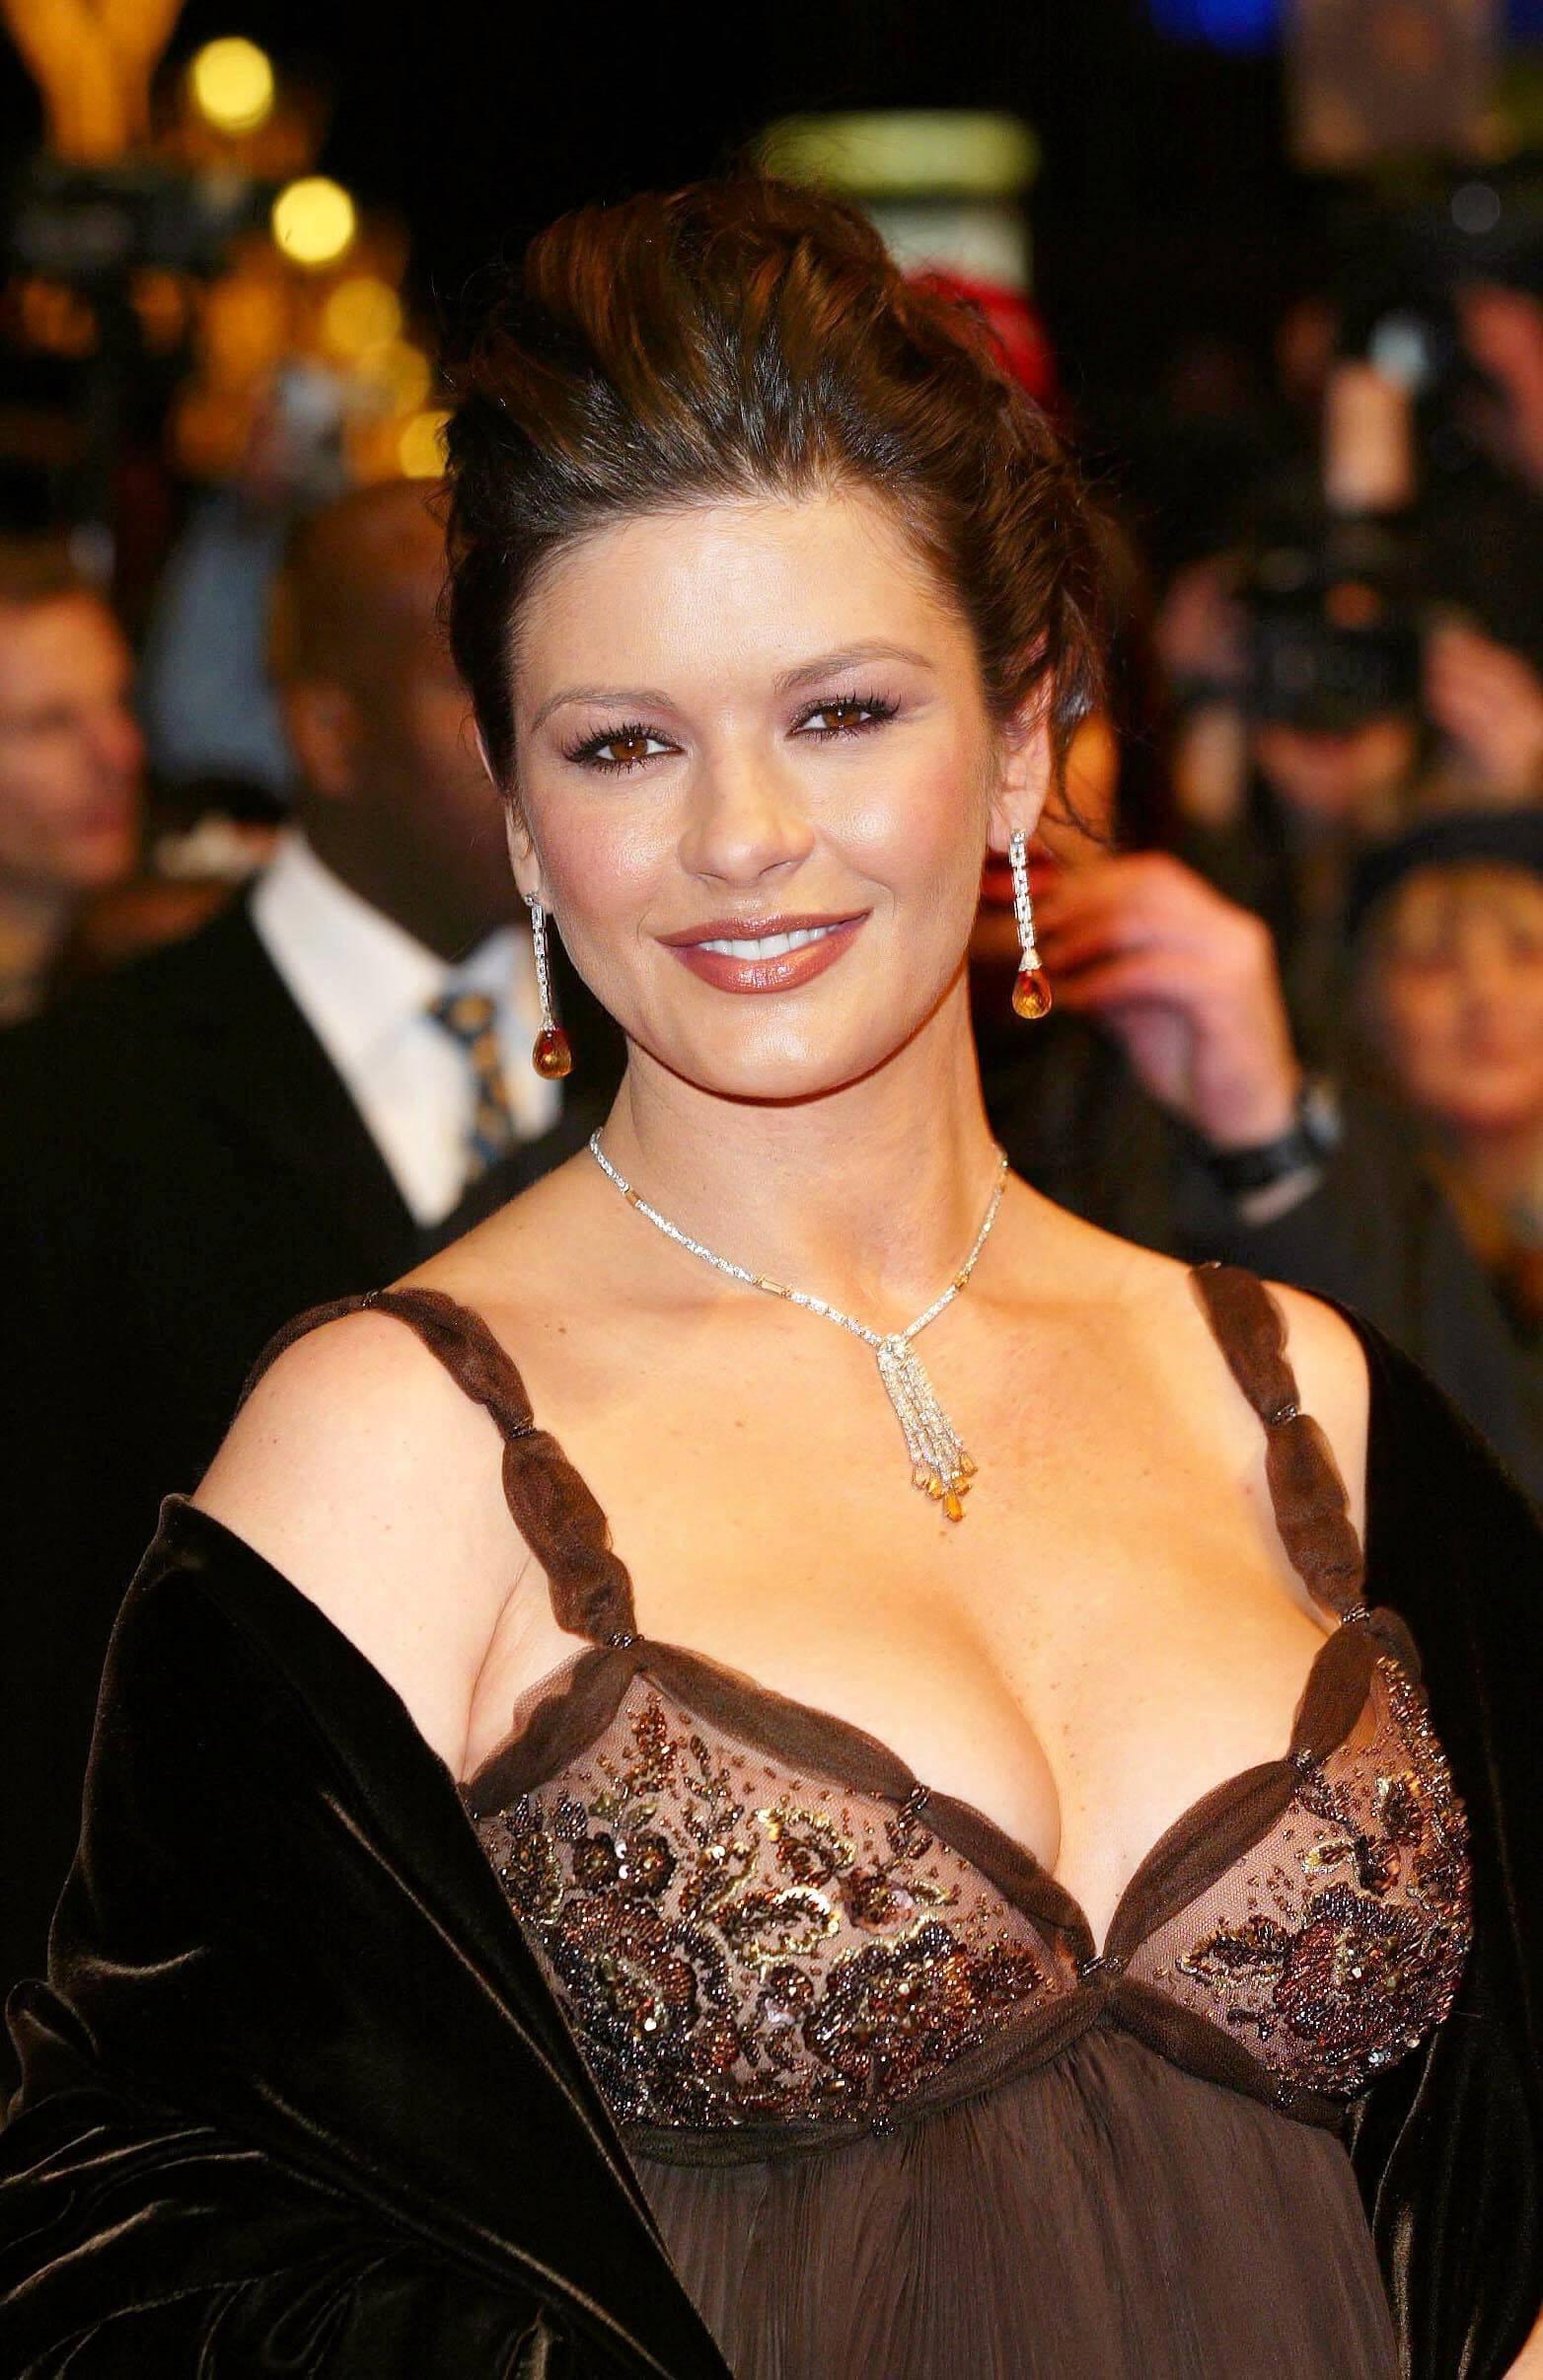 Catherine Zeta-Jones boobs pictures